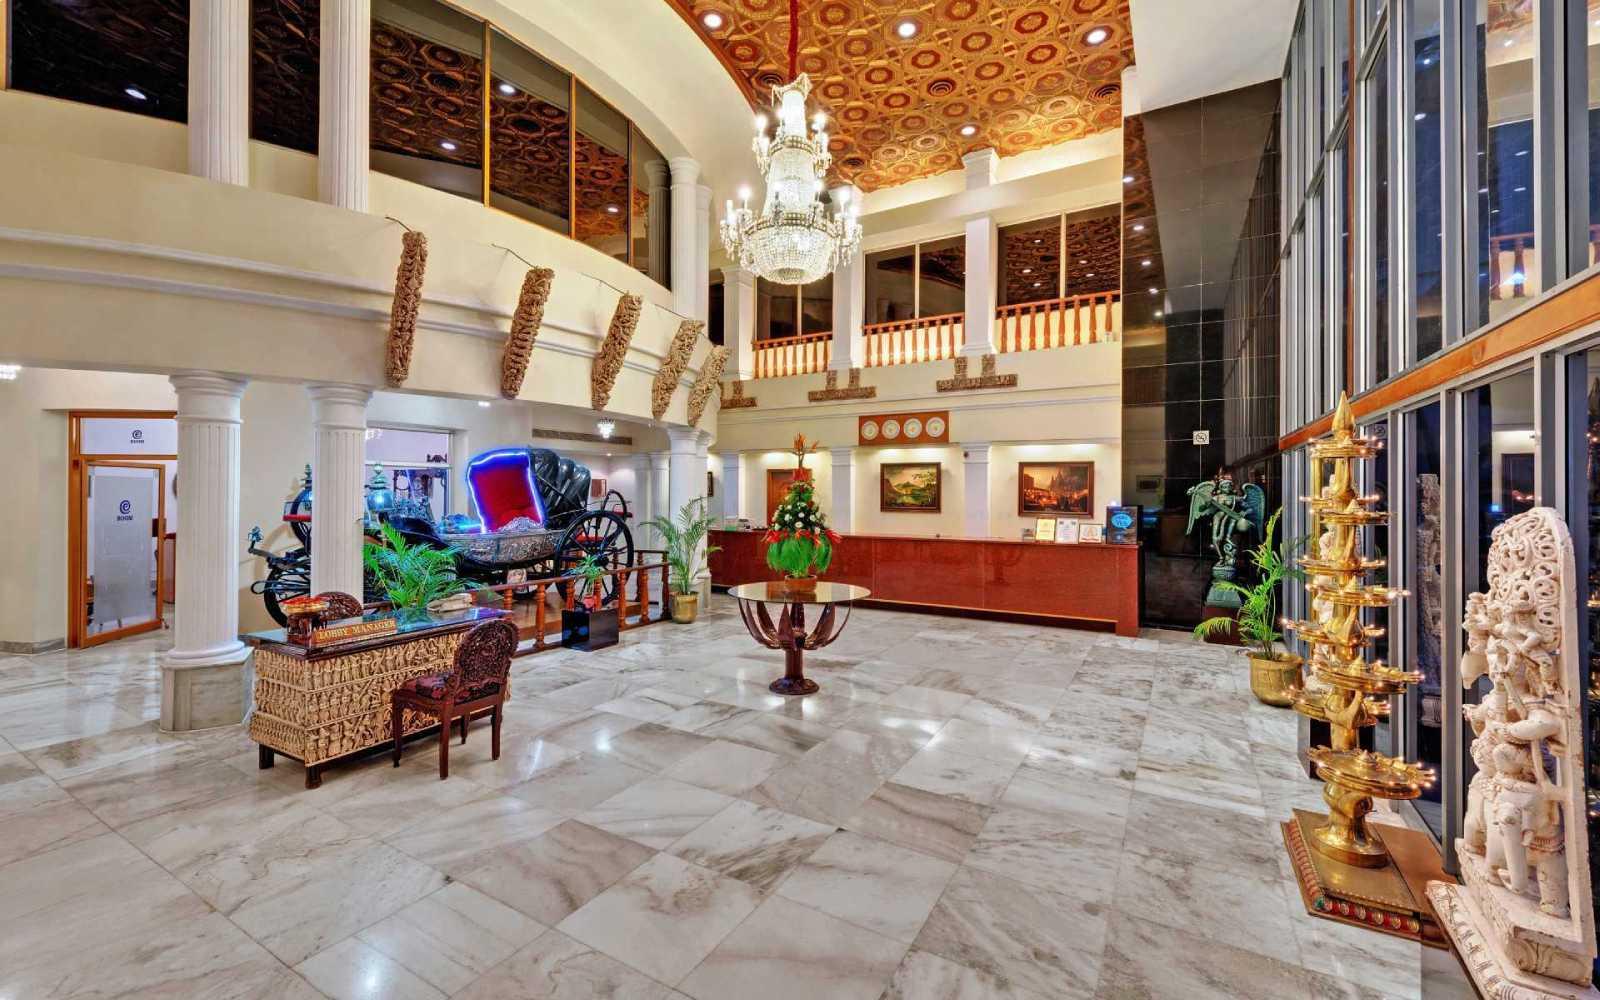 chennai banner ambassador pallava 2 - The Ambassador | Heritage Hotels in Mumbai, Aurangabad, Chennai - Ambassador Hotels